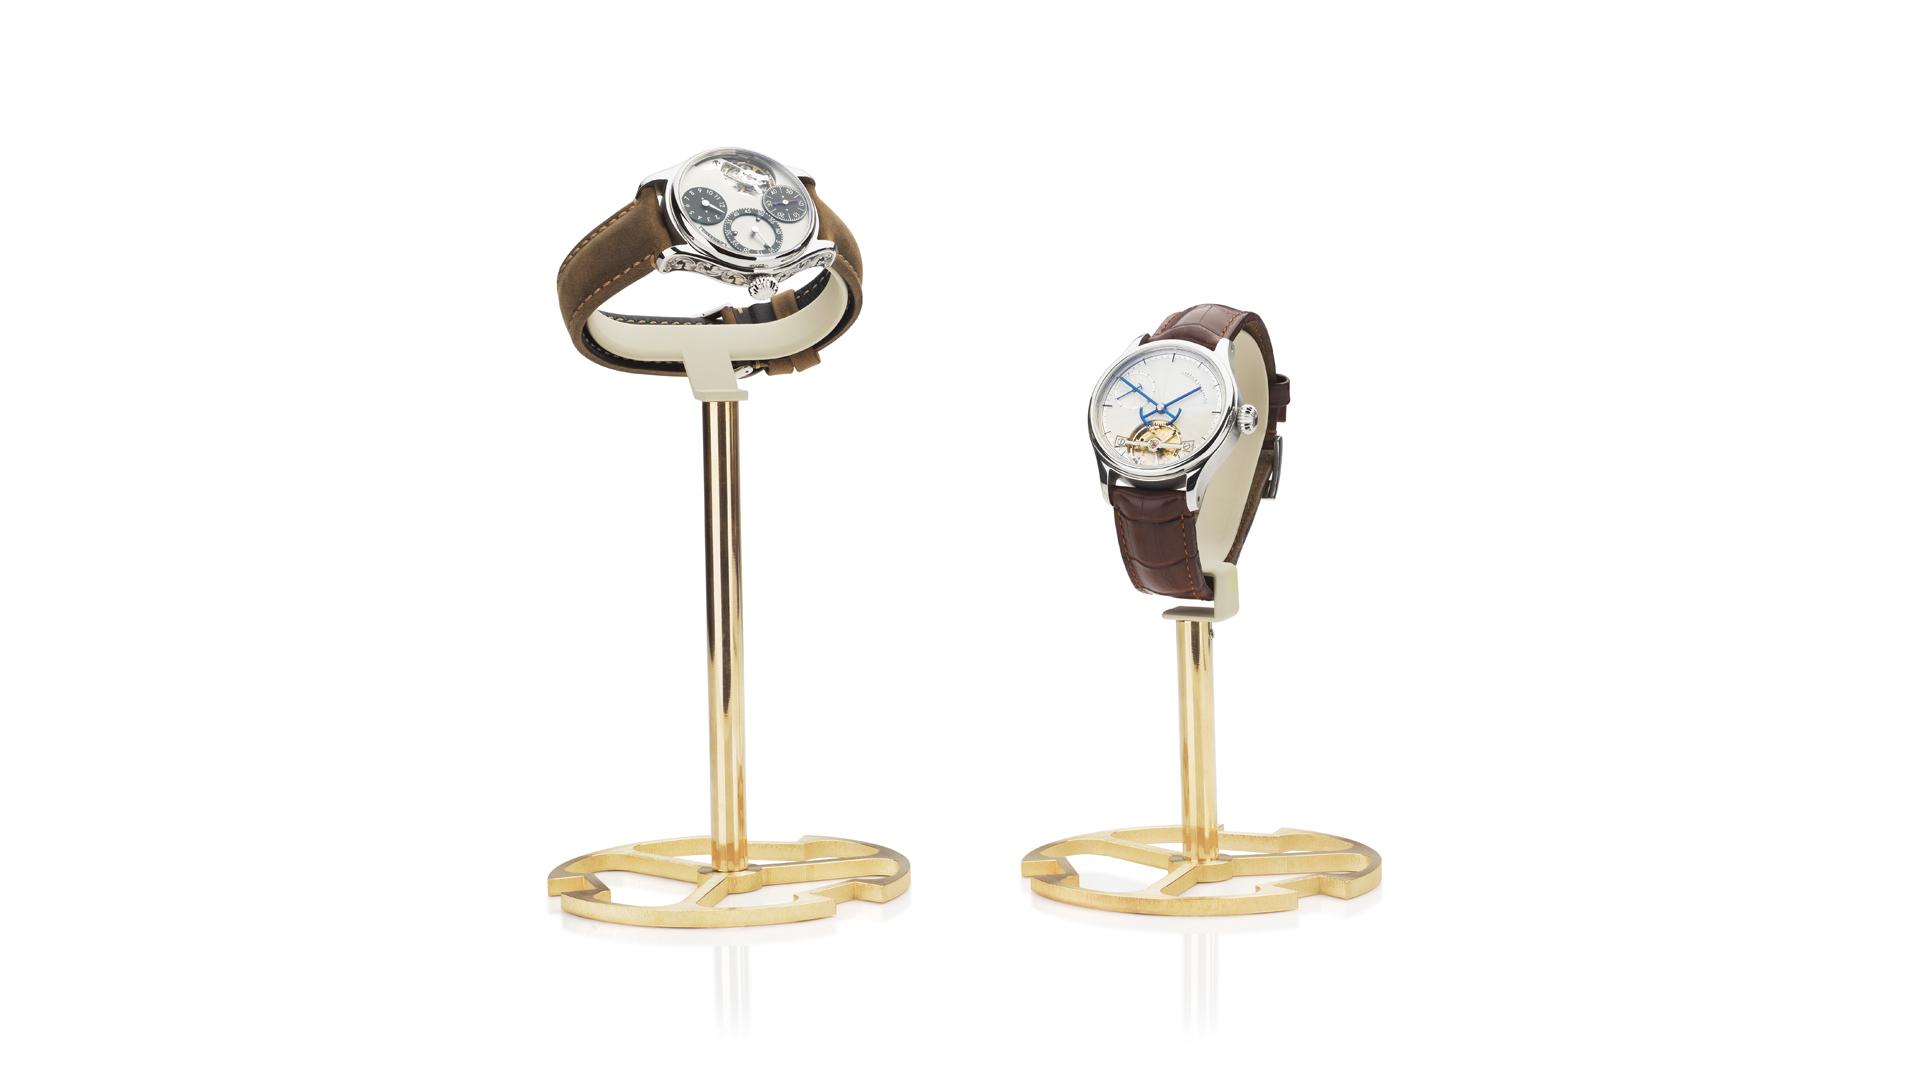 Garrick wristwatch display stand